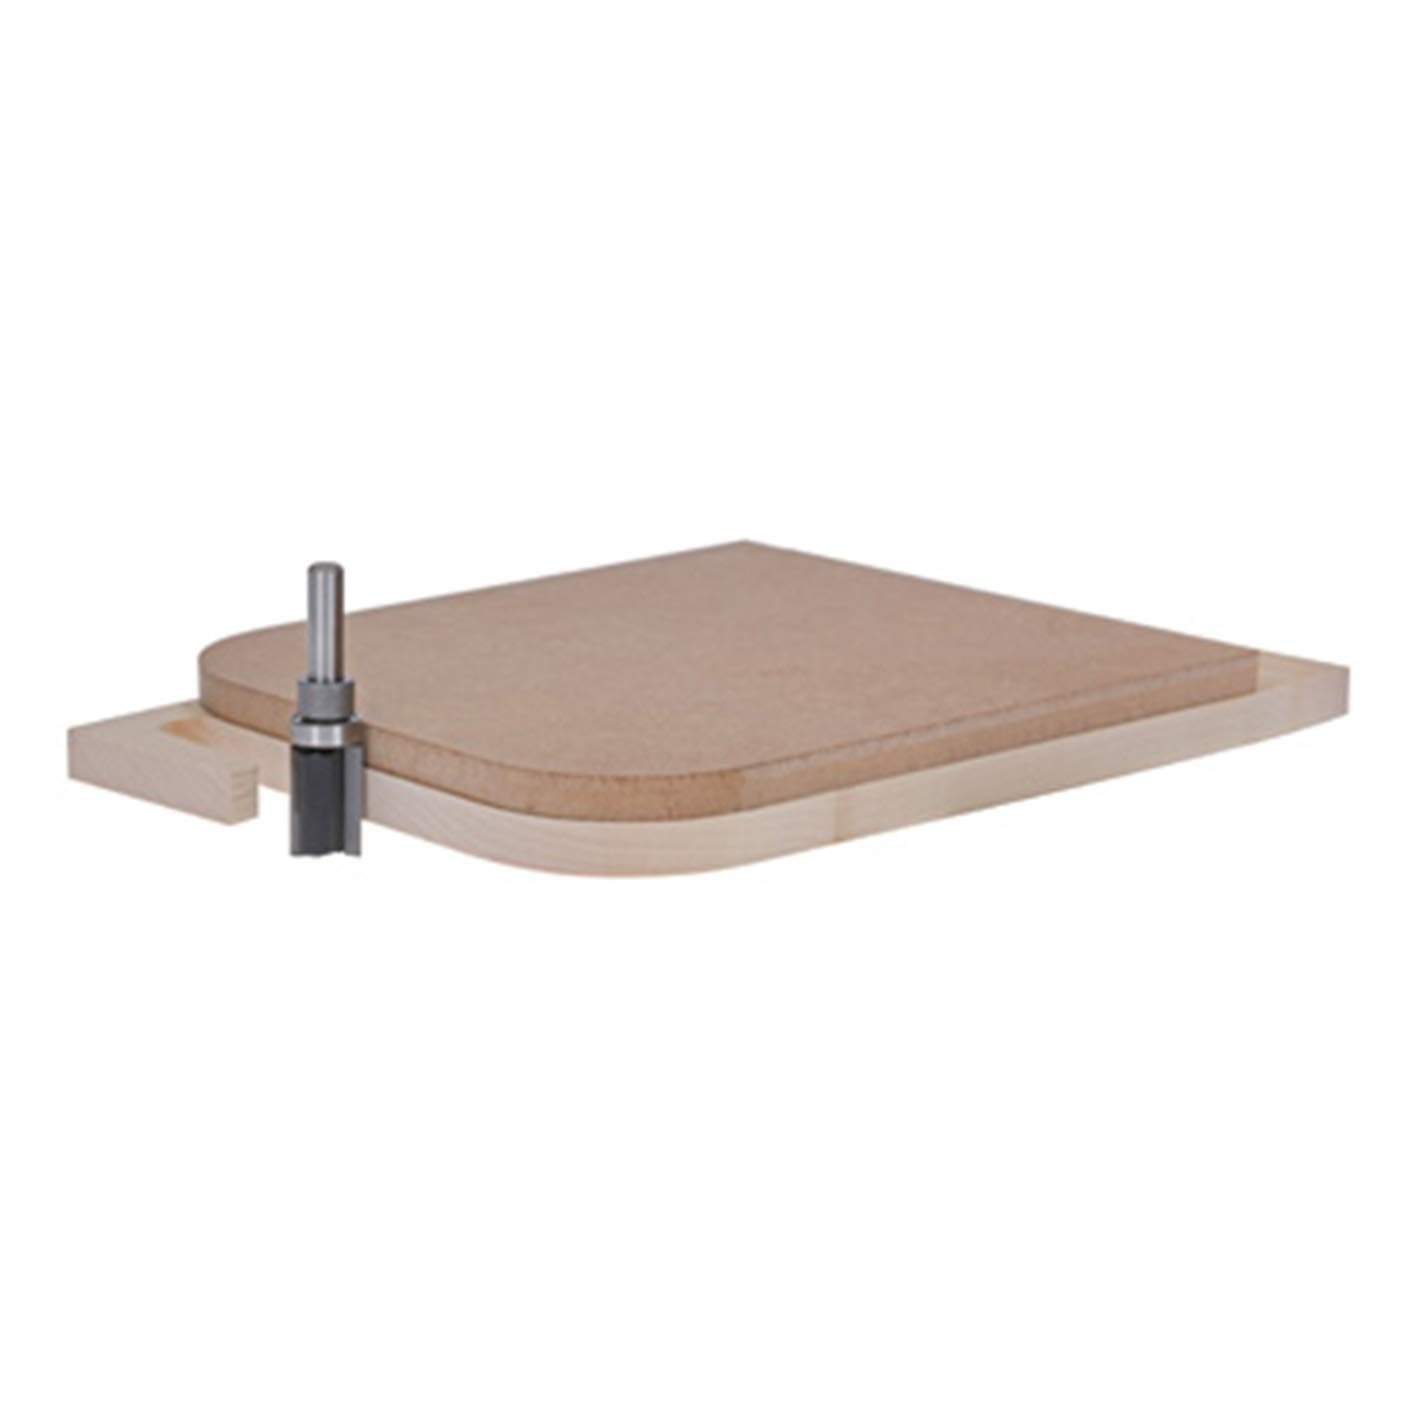 Set di frese Bosch Professional 2607017471 15tlg per legno, per frese verticali con stelo da 6 mm